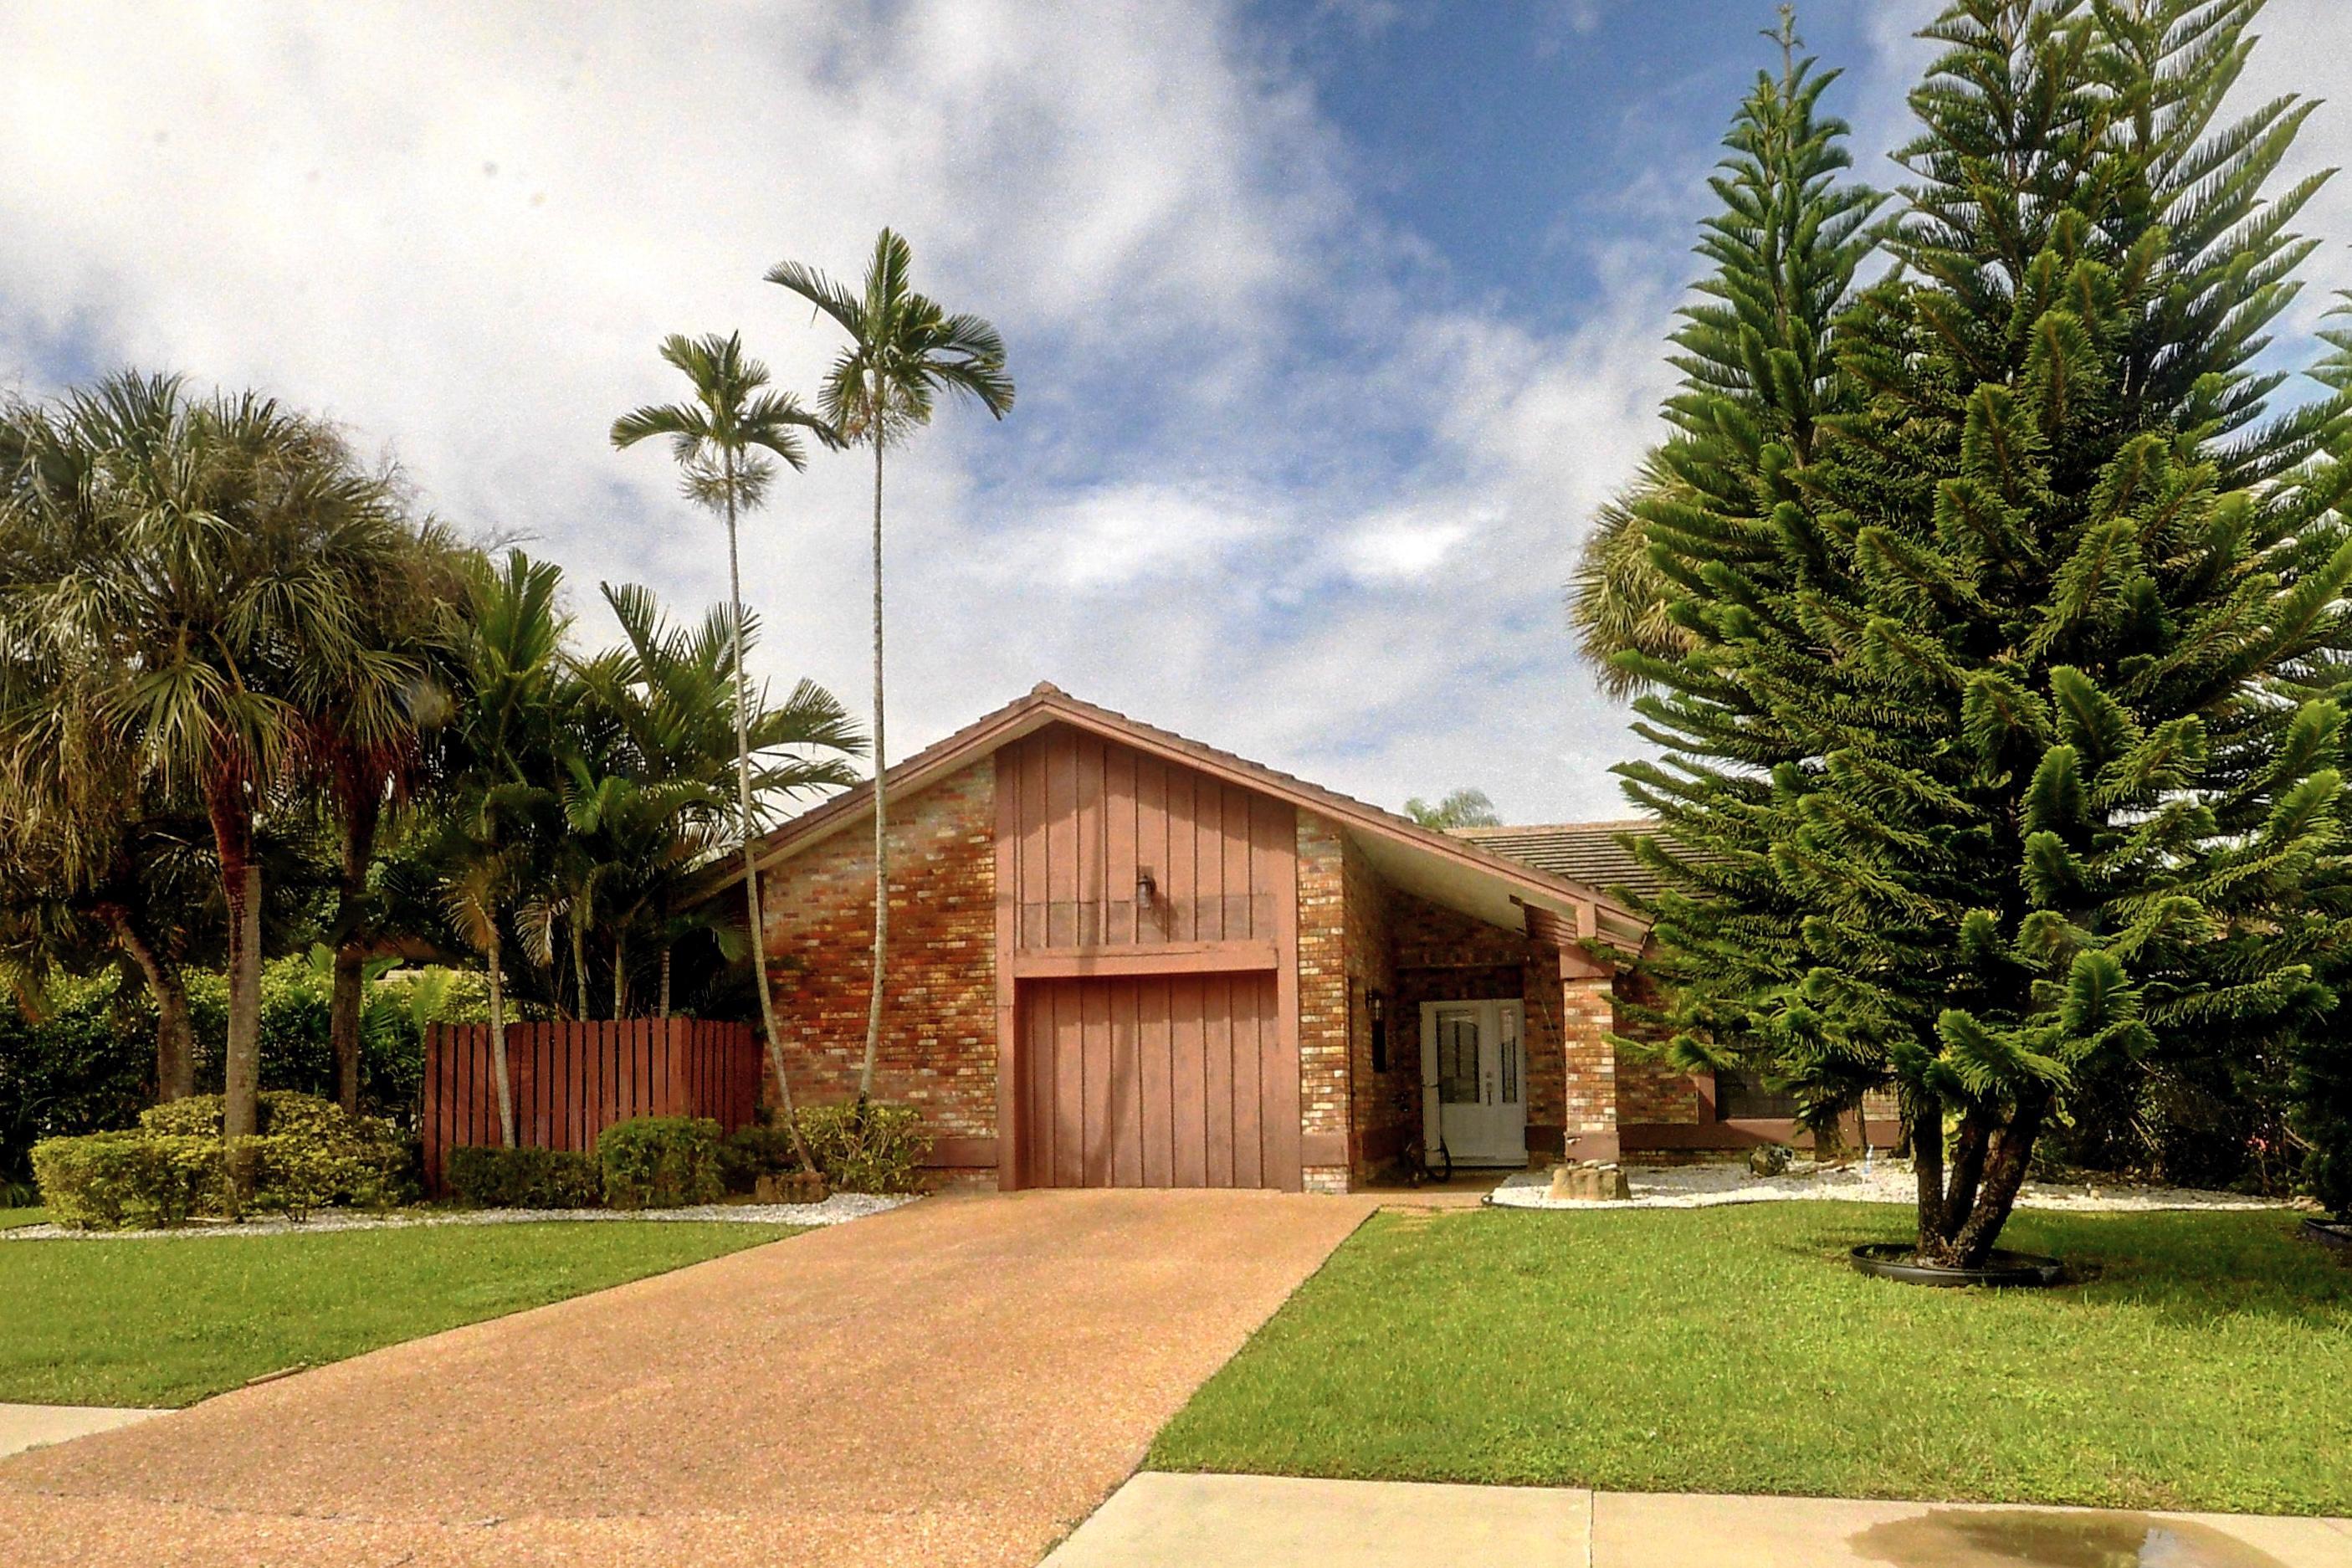 Home for sale in Boca Greens Boca Raton Florida